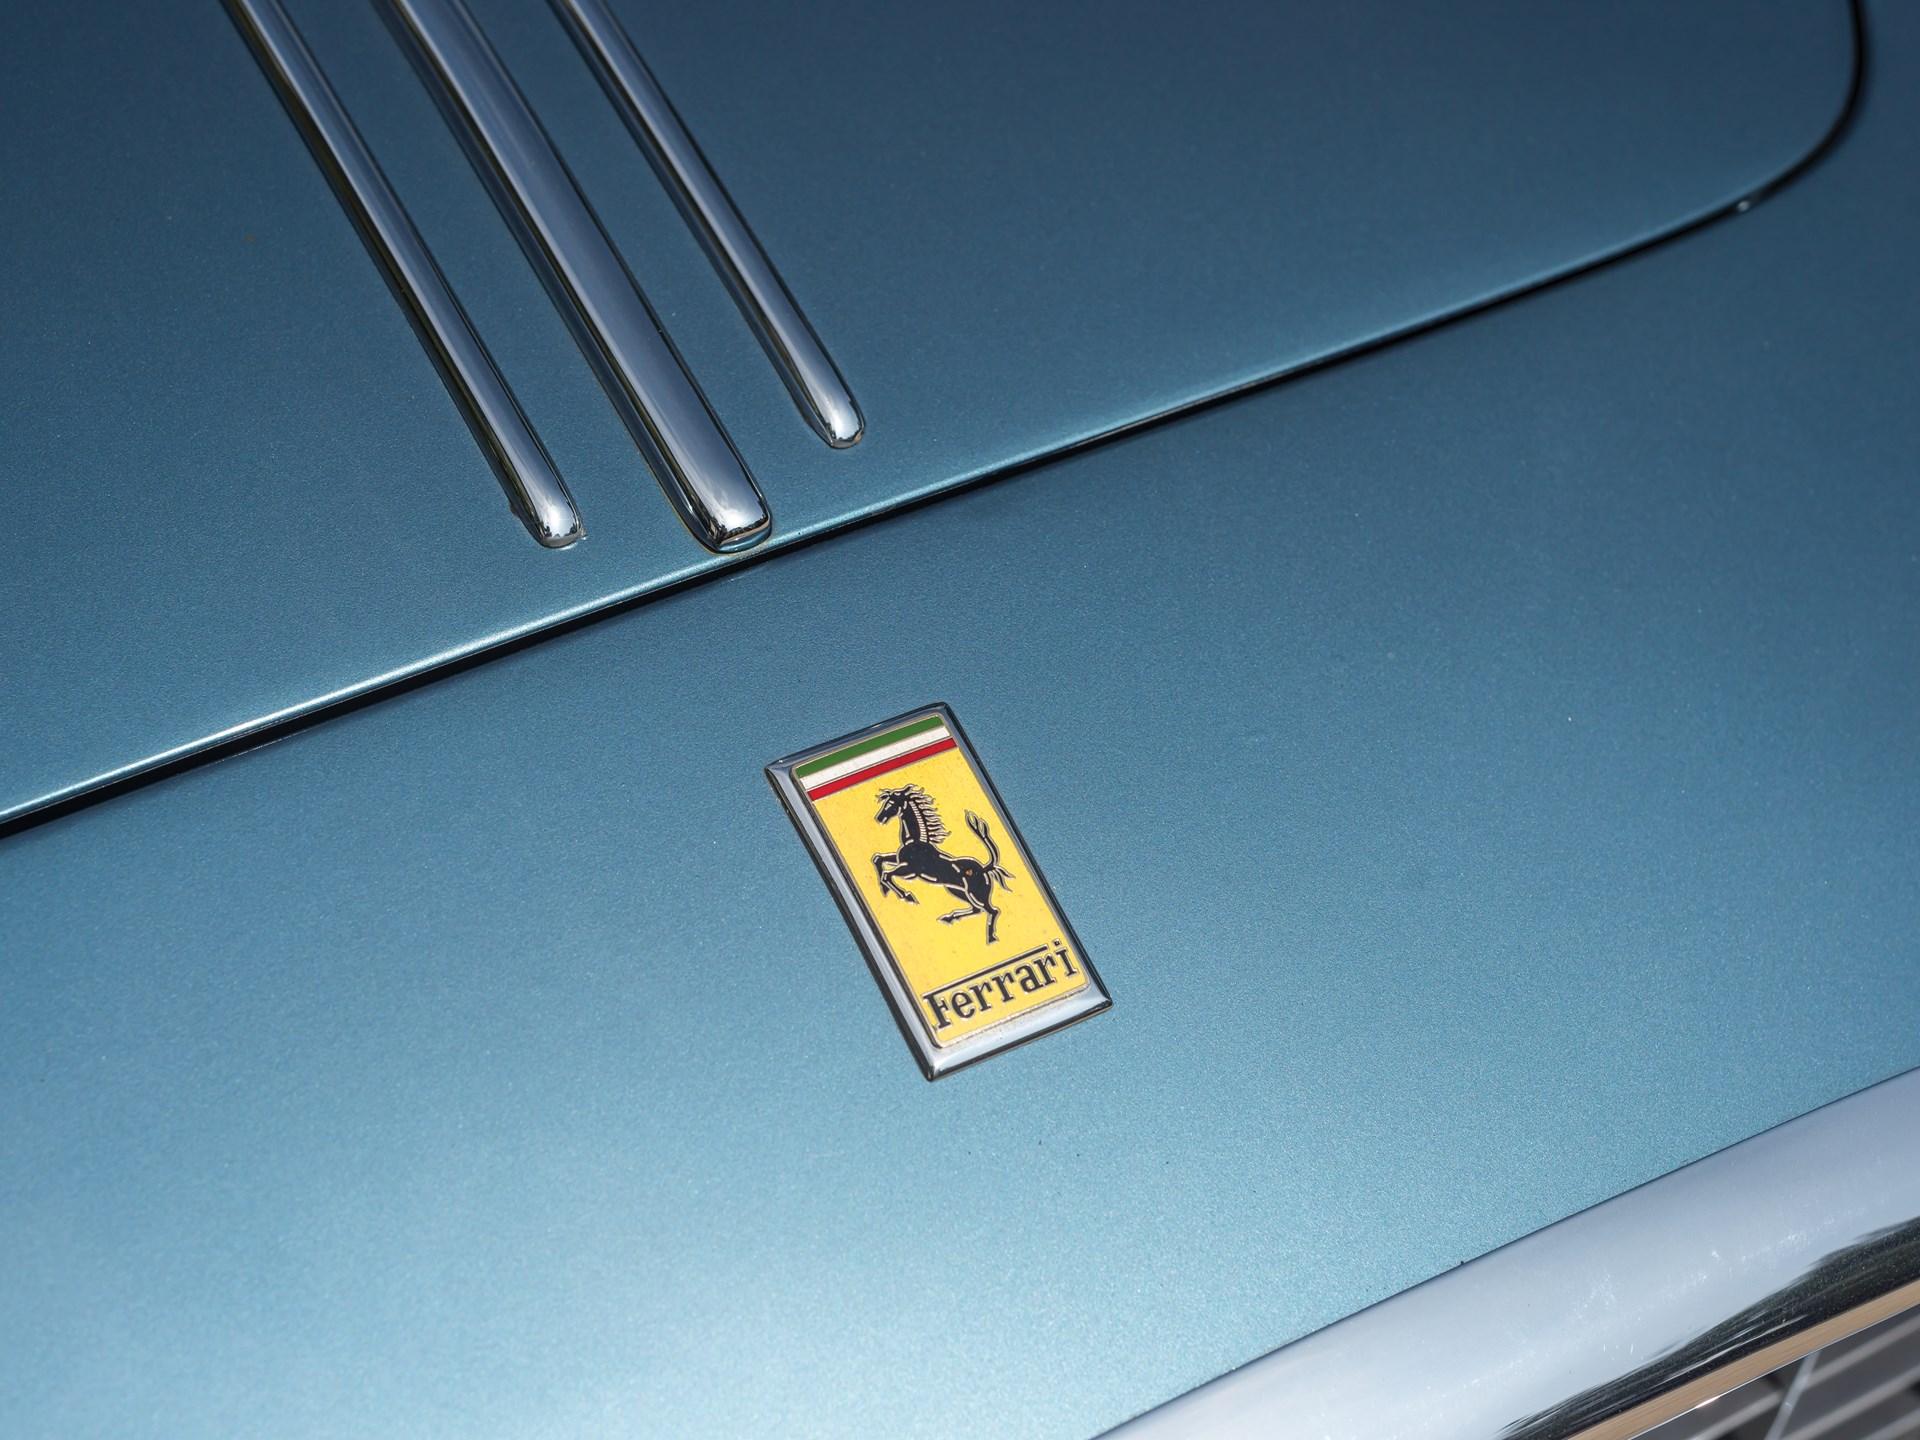 1952 Ferrari 212 Europa Coupe by Pinin Farina